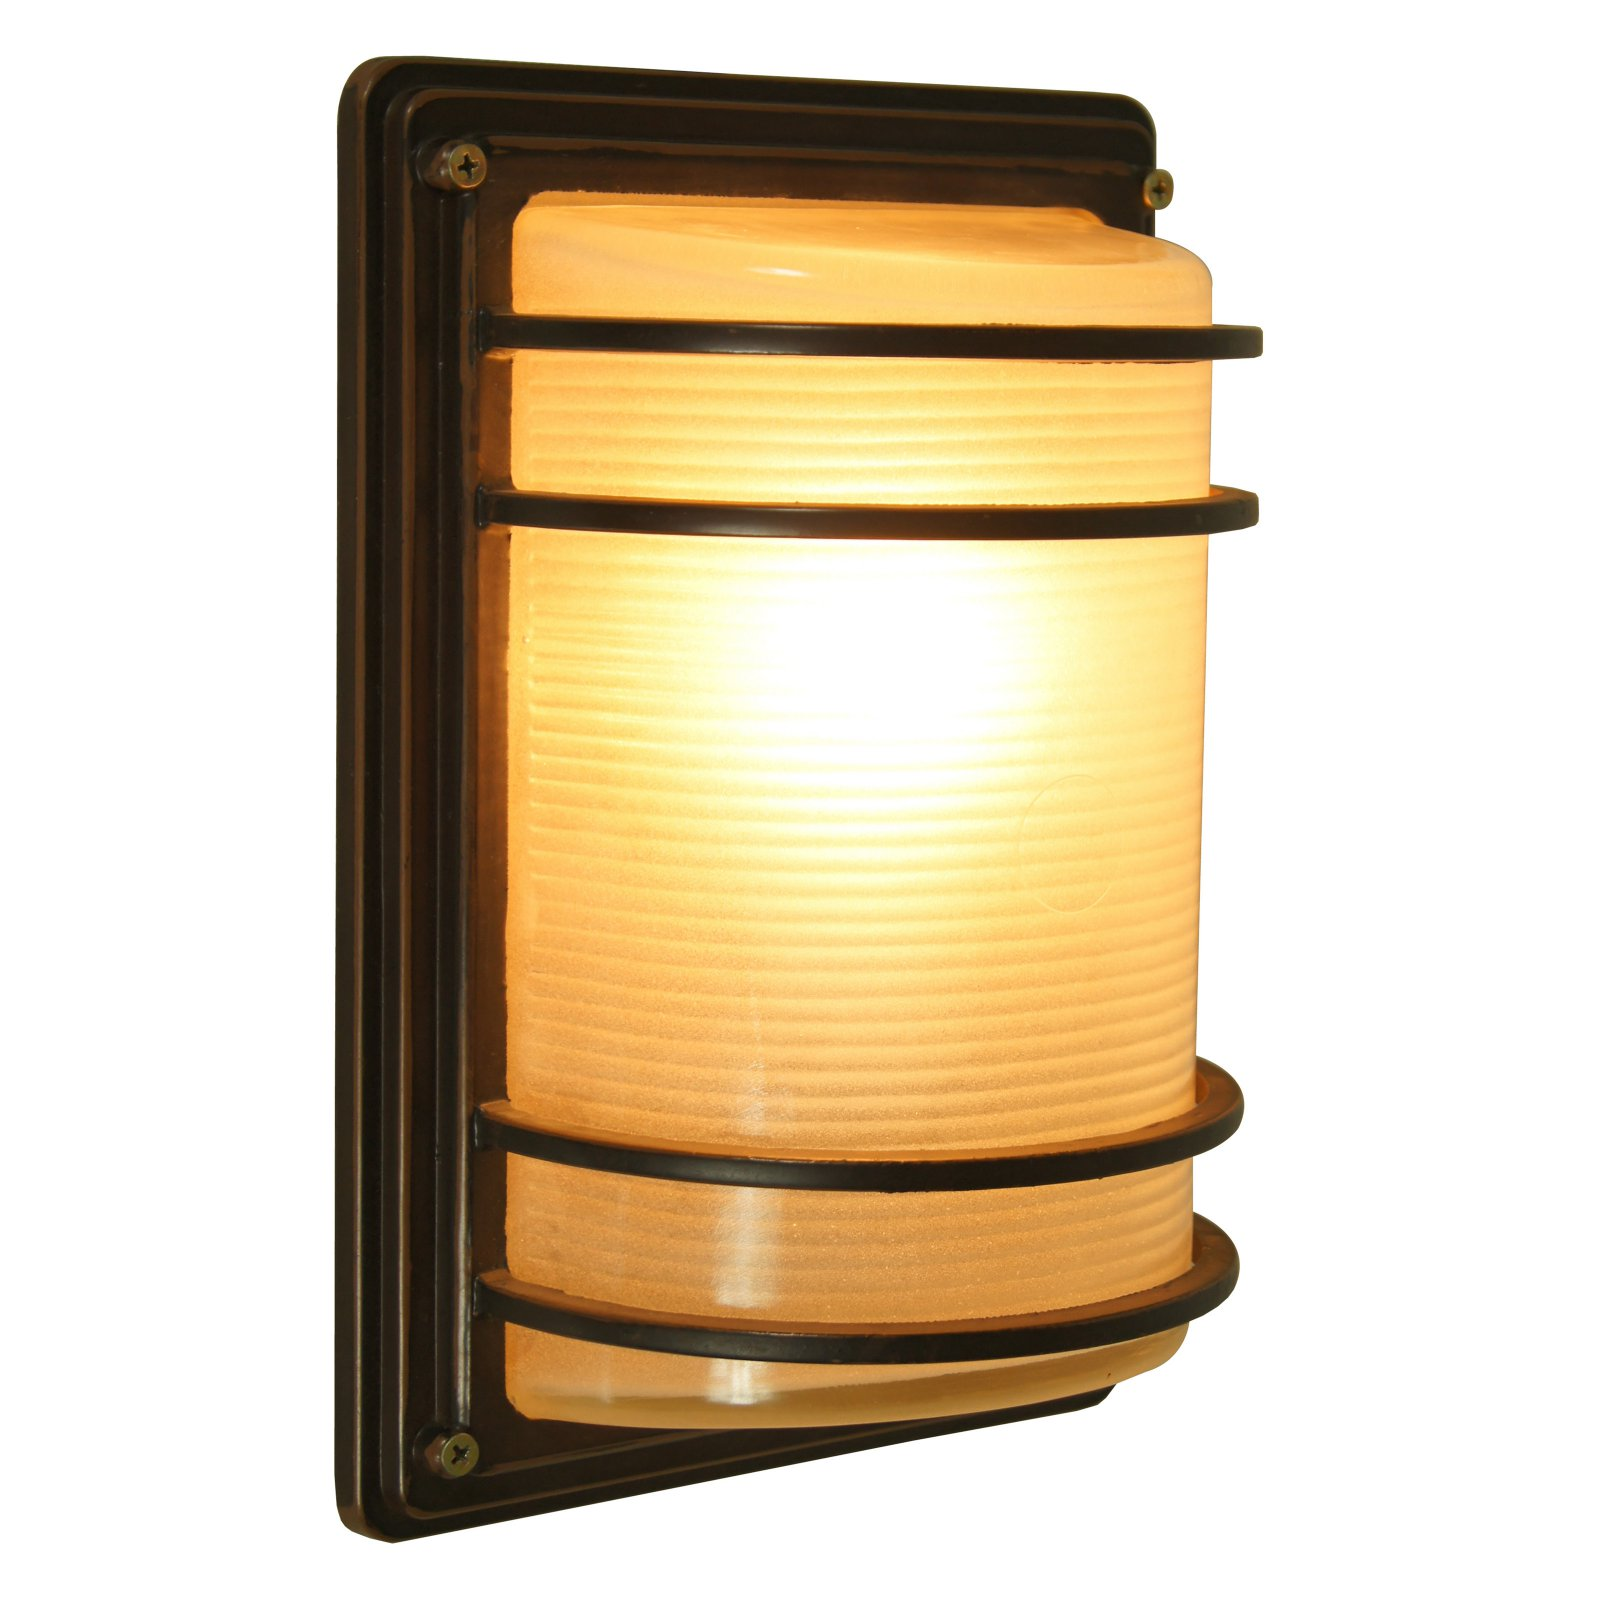 Living District LDOD2400 Outdoor Wall Lantern